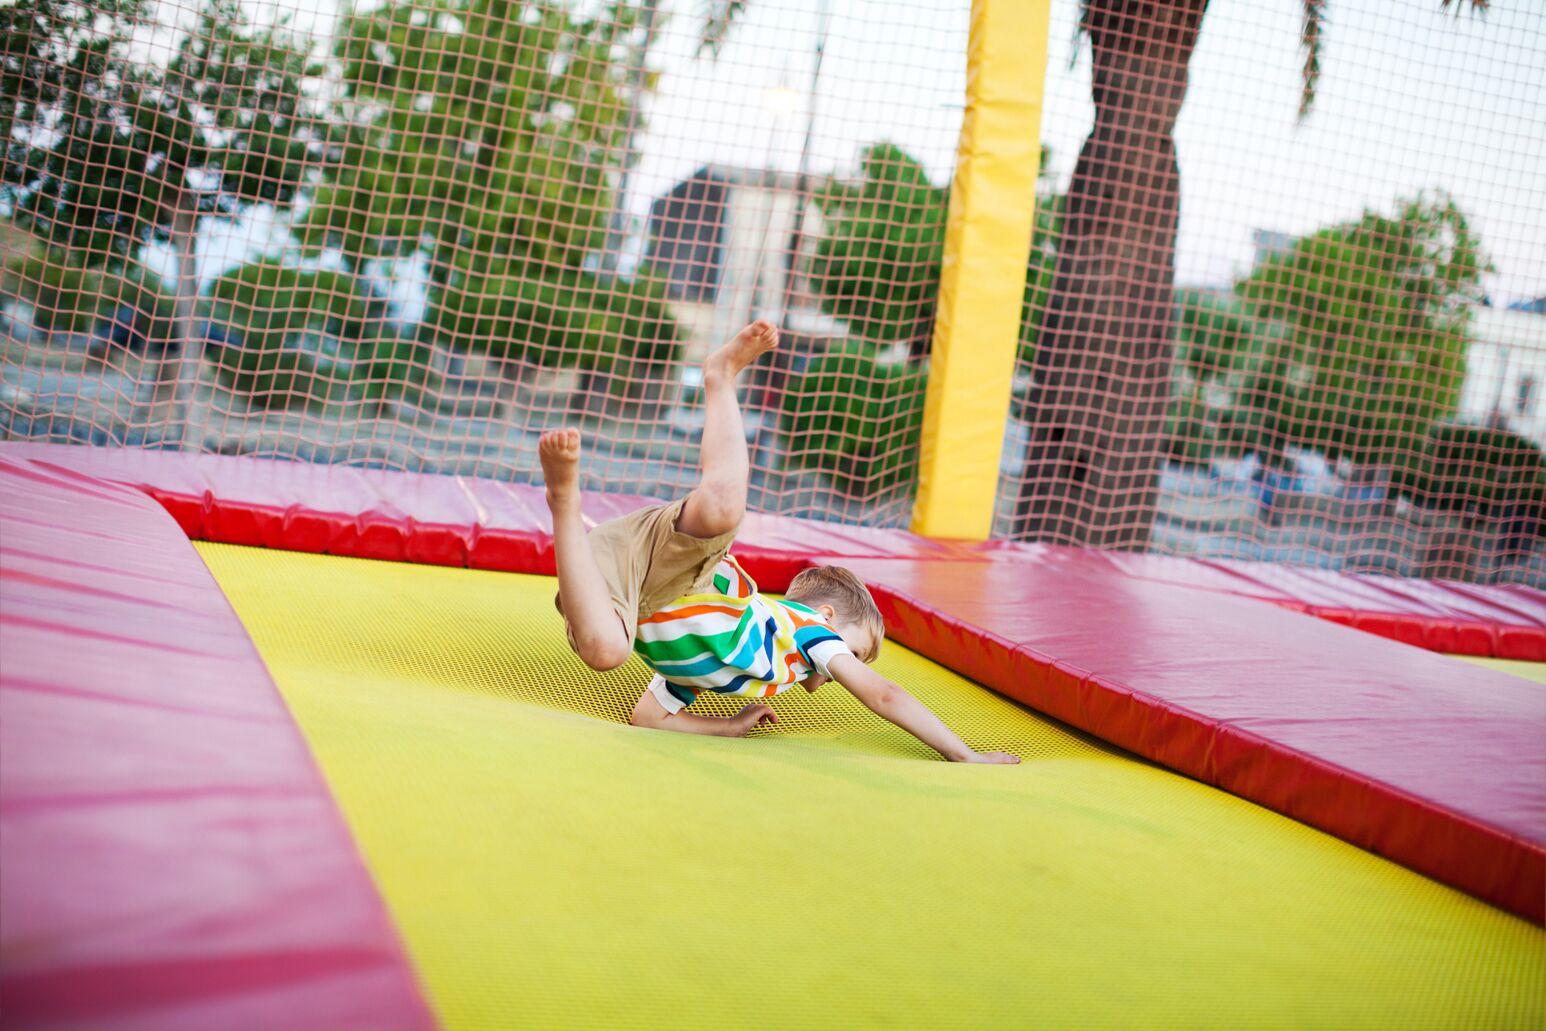 A child falls on a trampoline